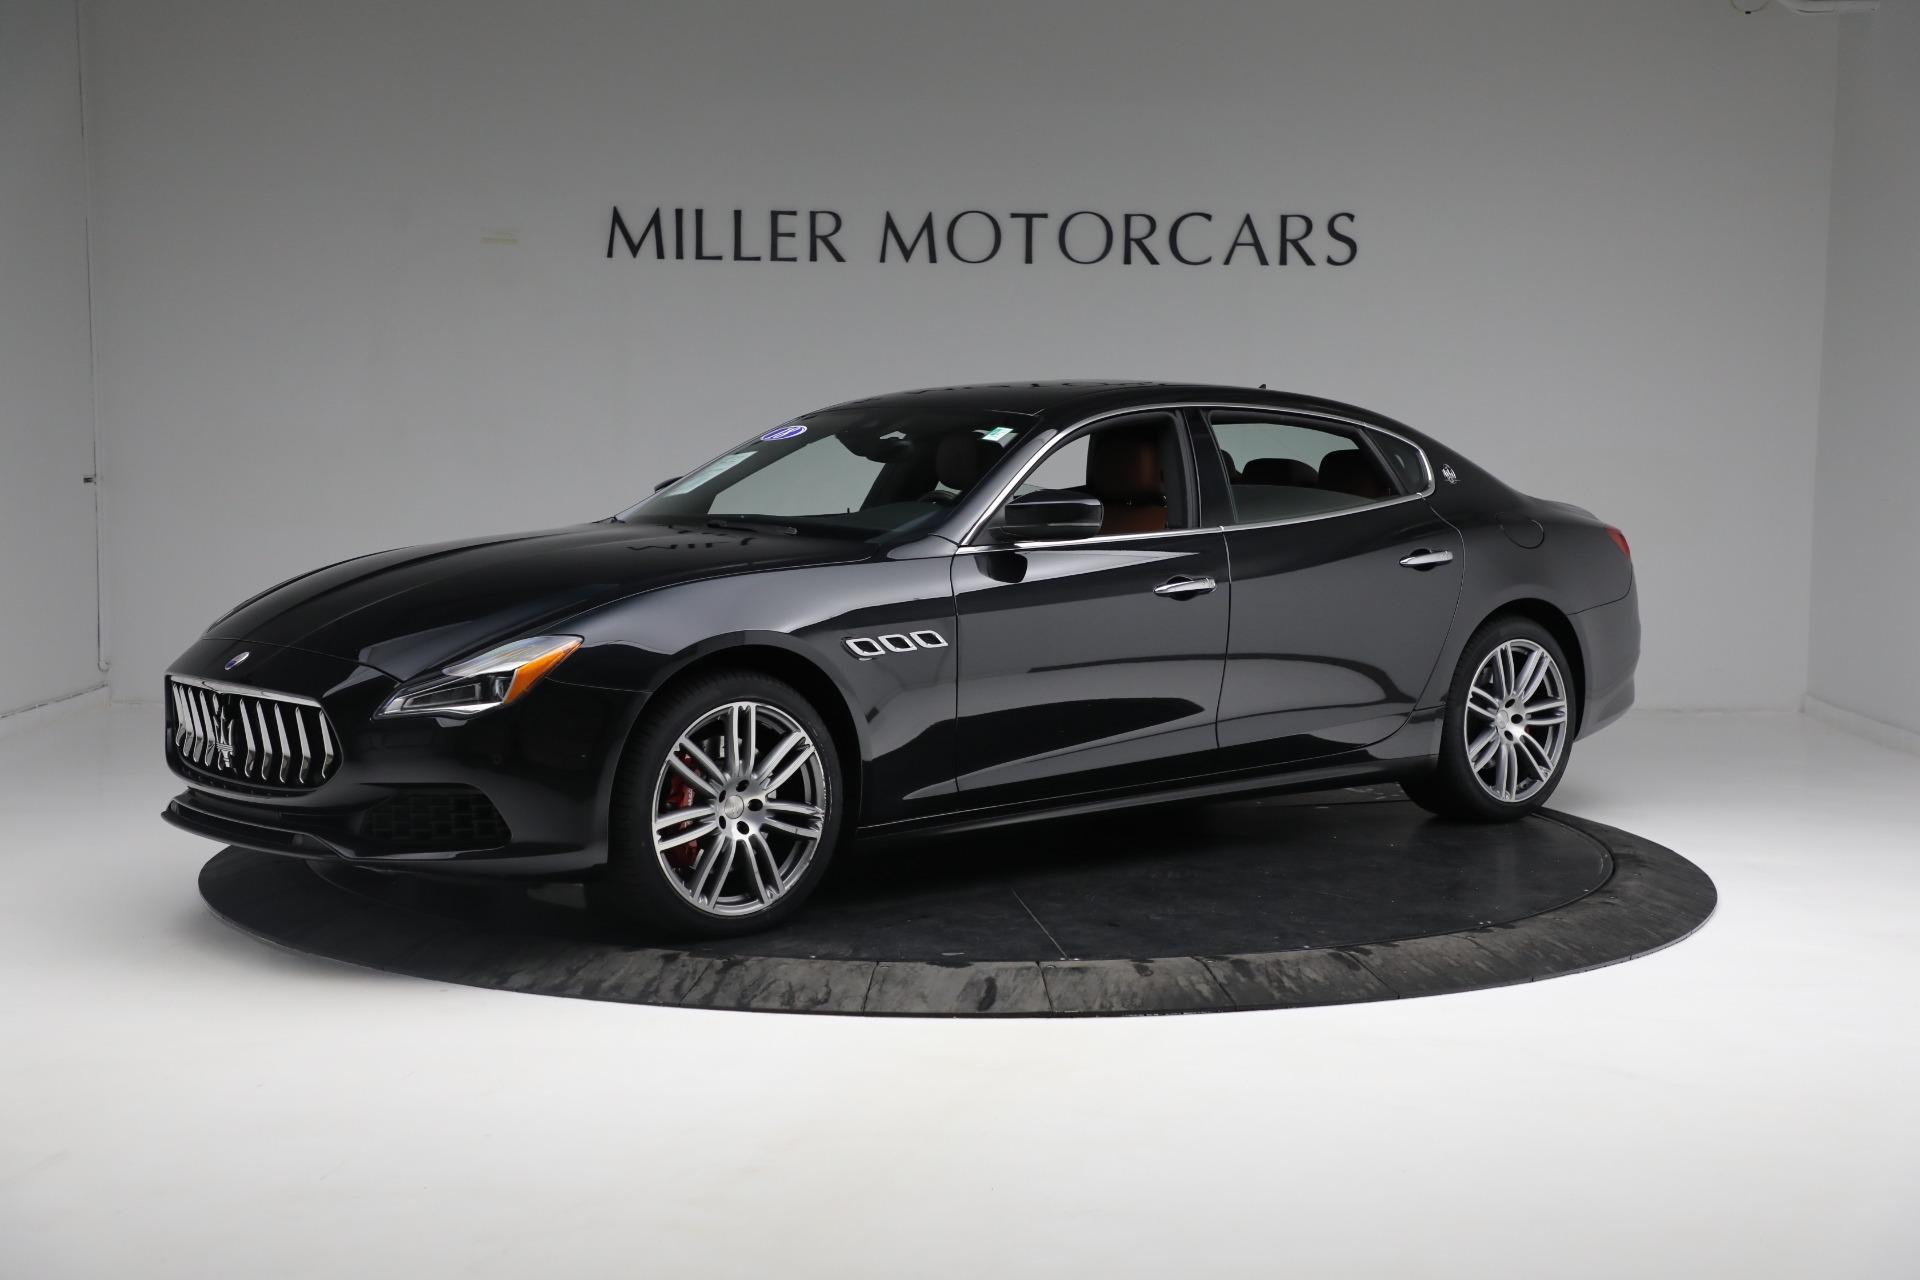 New-2018-Maserati-Quattroporte-S-Q4